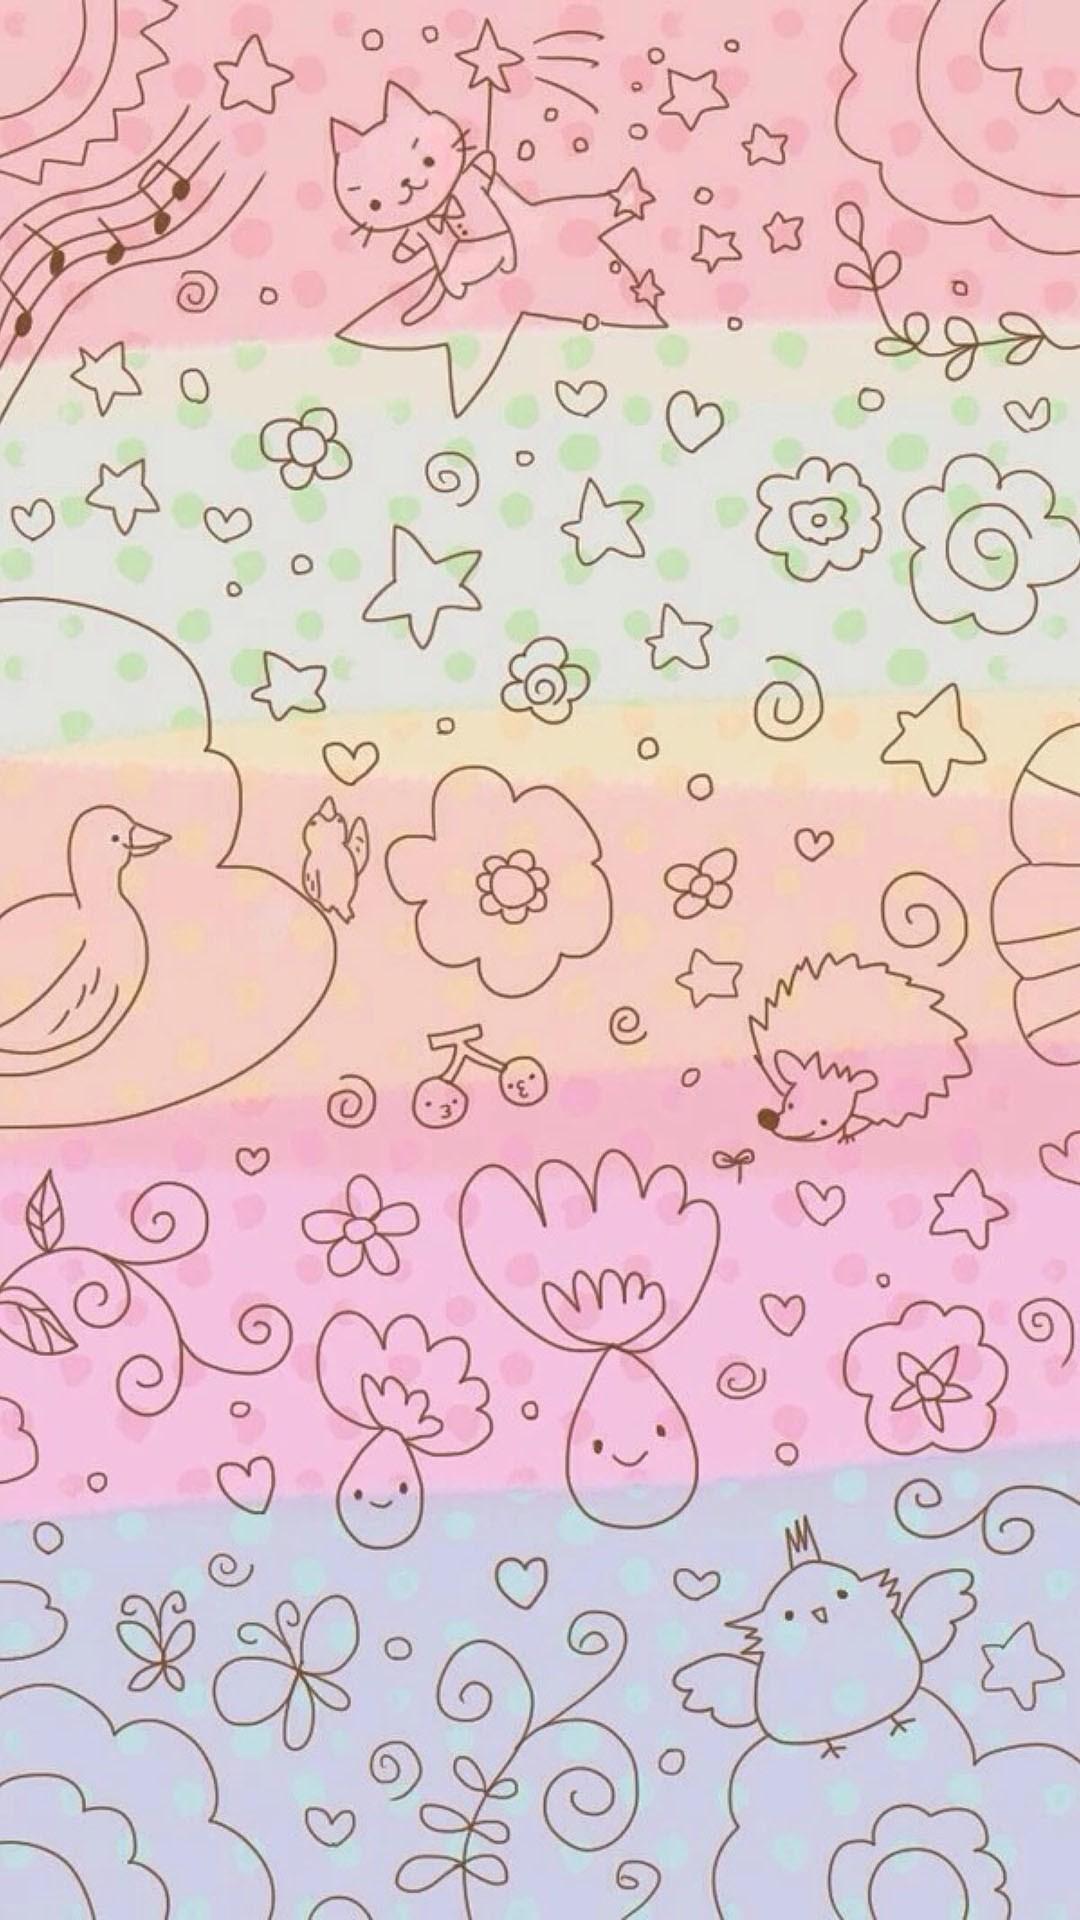 Dreamy Anime Cute Kitten Pattern Painting Background #iPhone #6 #wallpaper